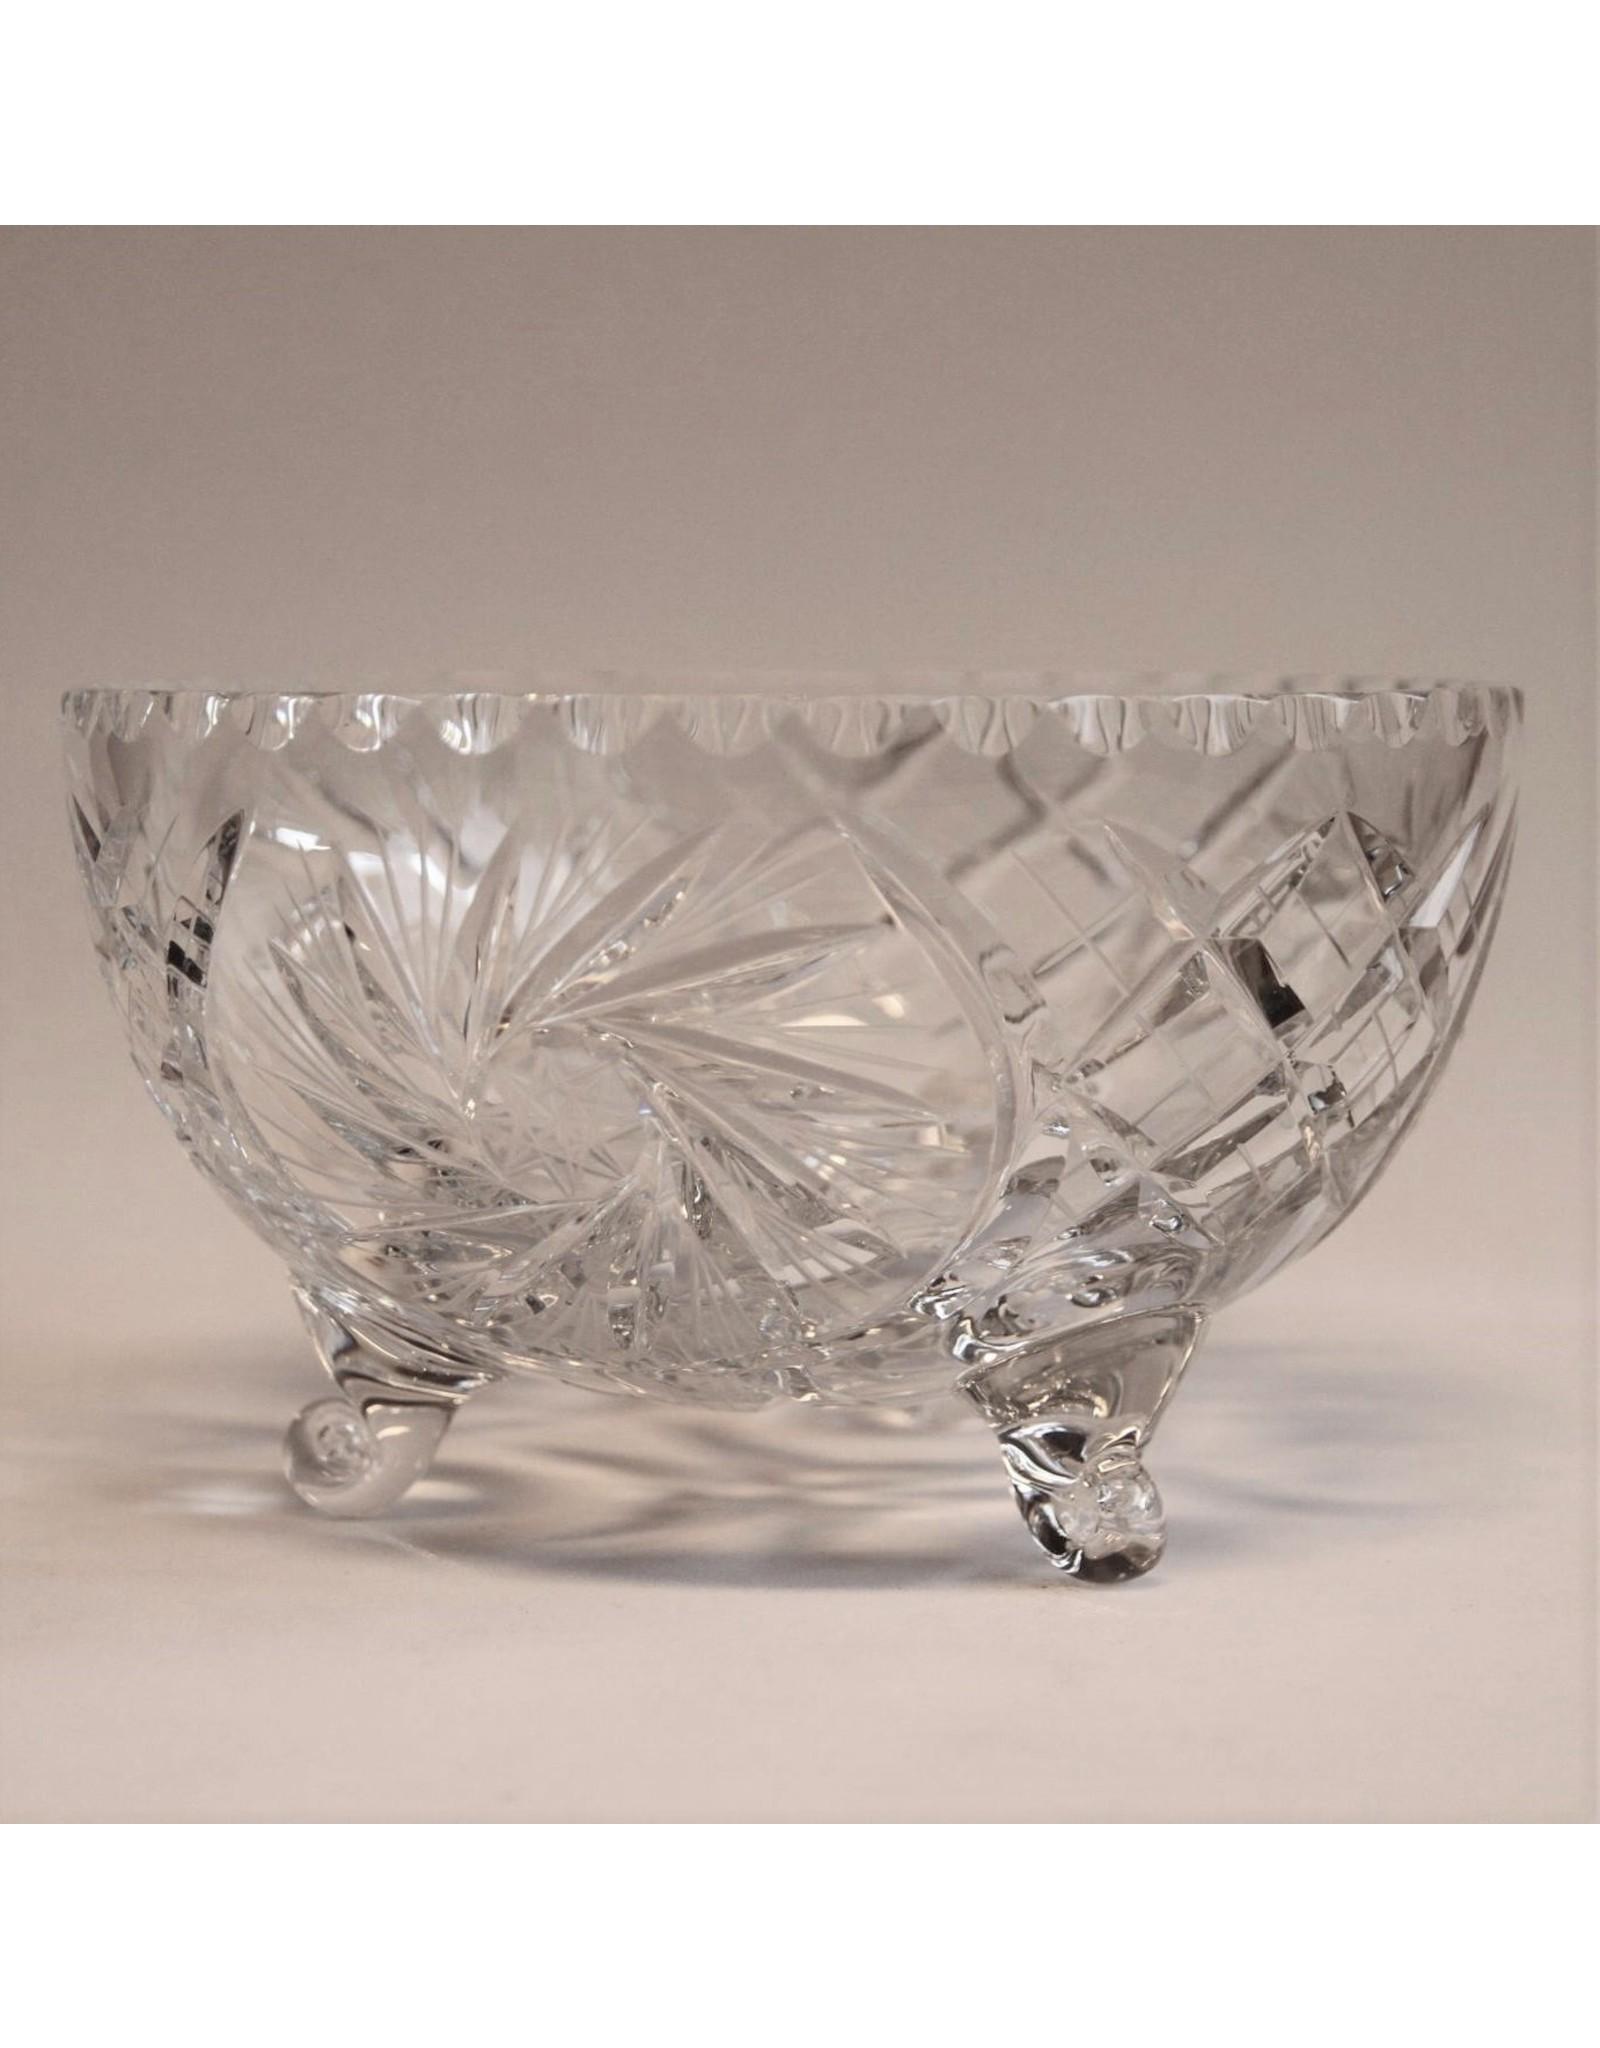 Crystal bowl - three feet, round, pinwheel crystal